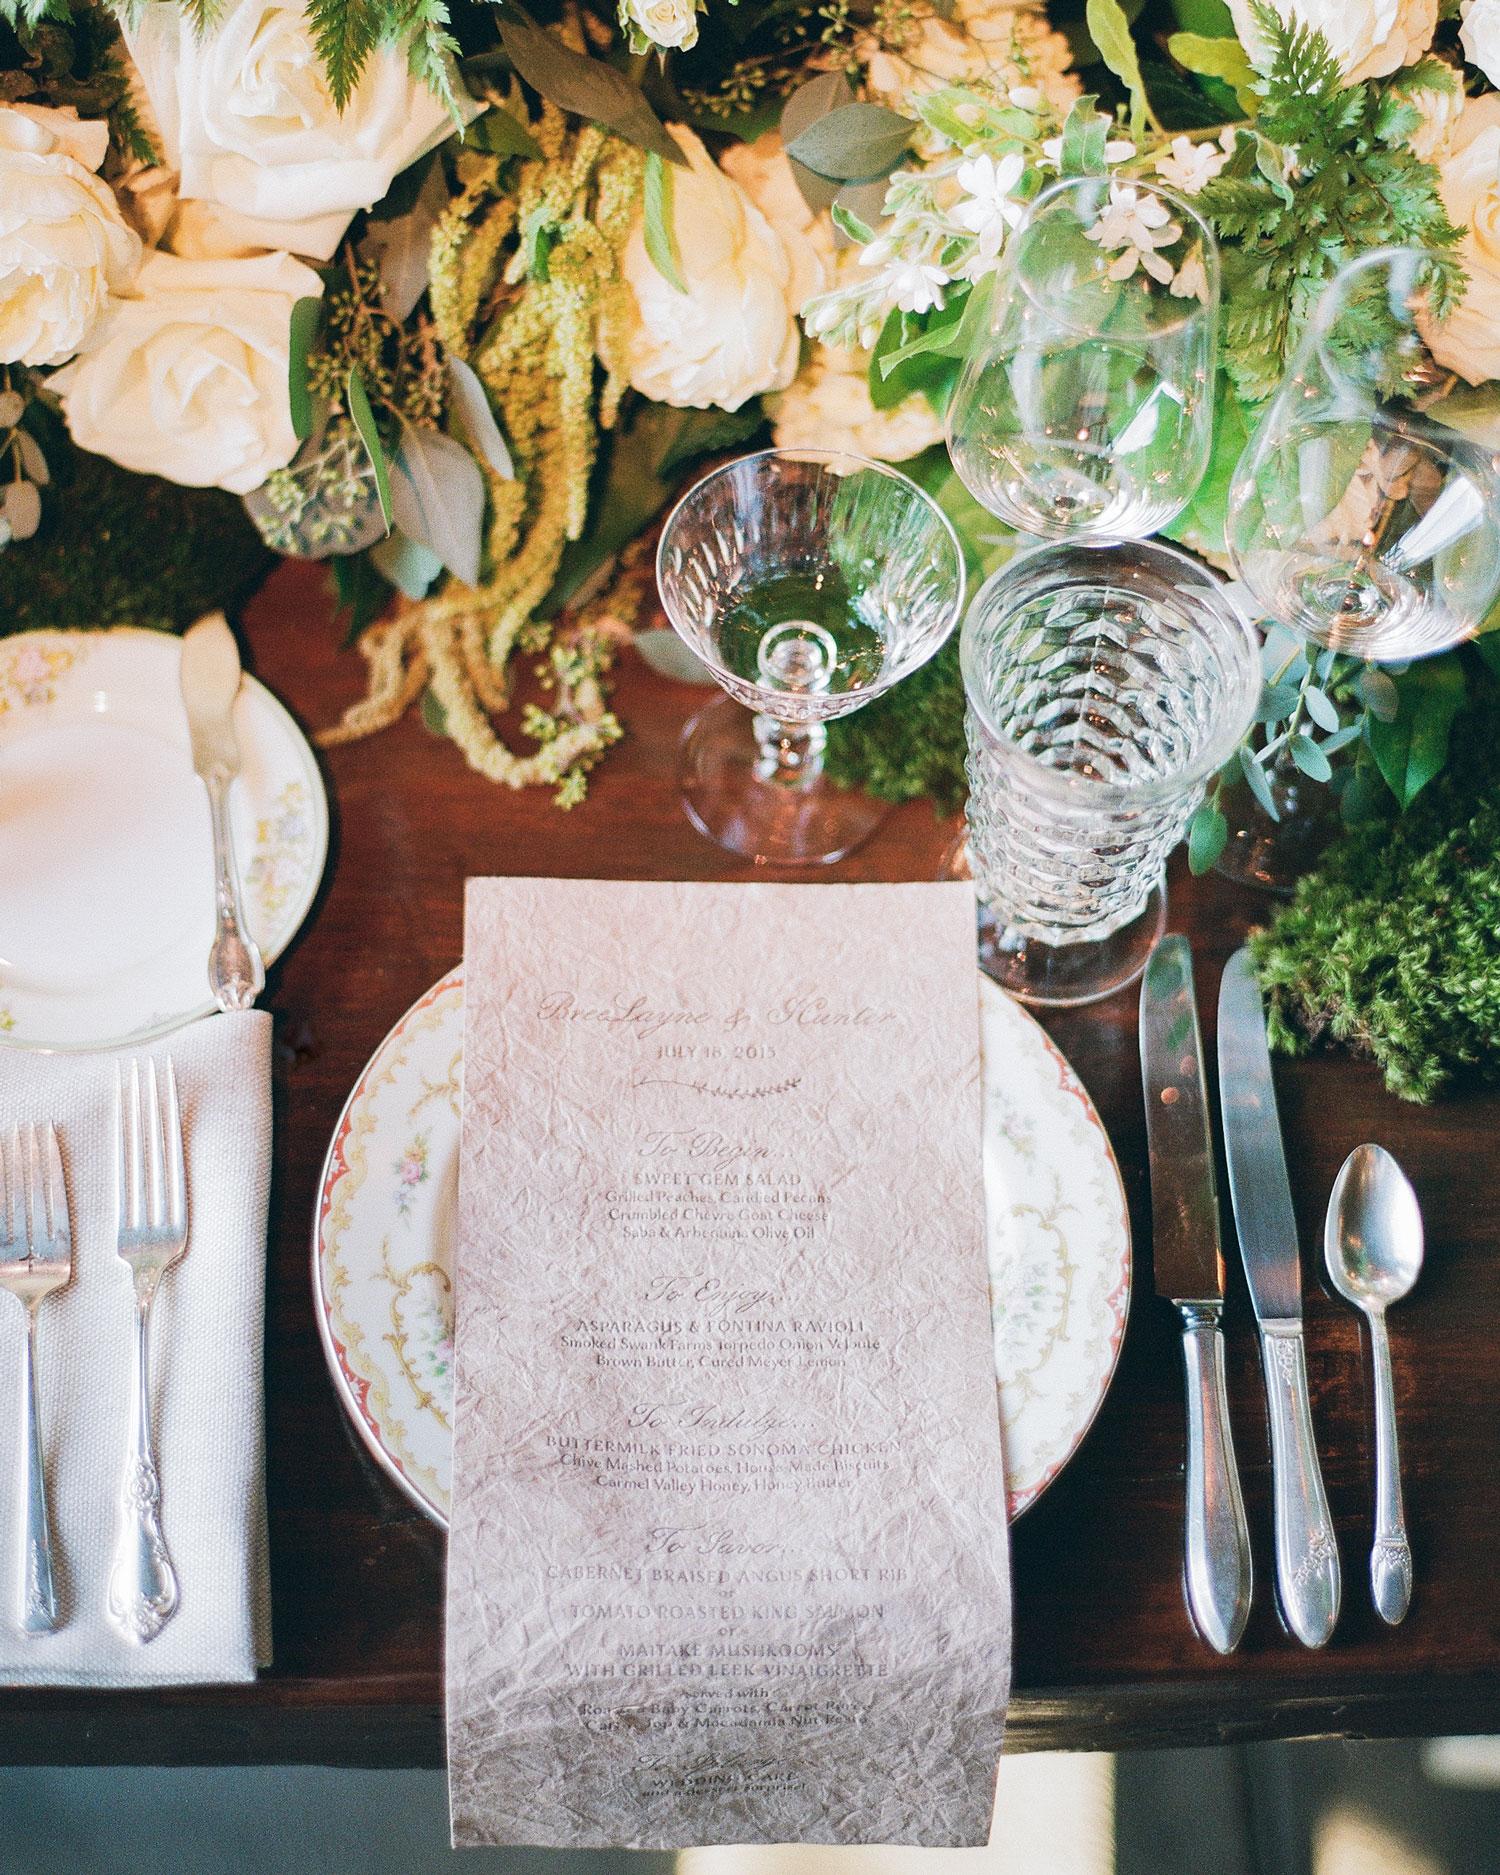 breelayne-hunter-wedding-california-0094-barn-santa-lucia-preserve-placesetting-s112849.jpg